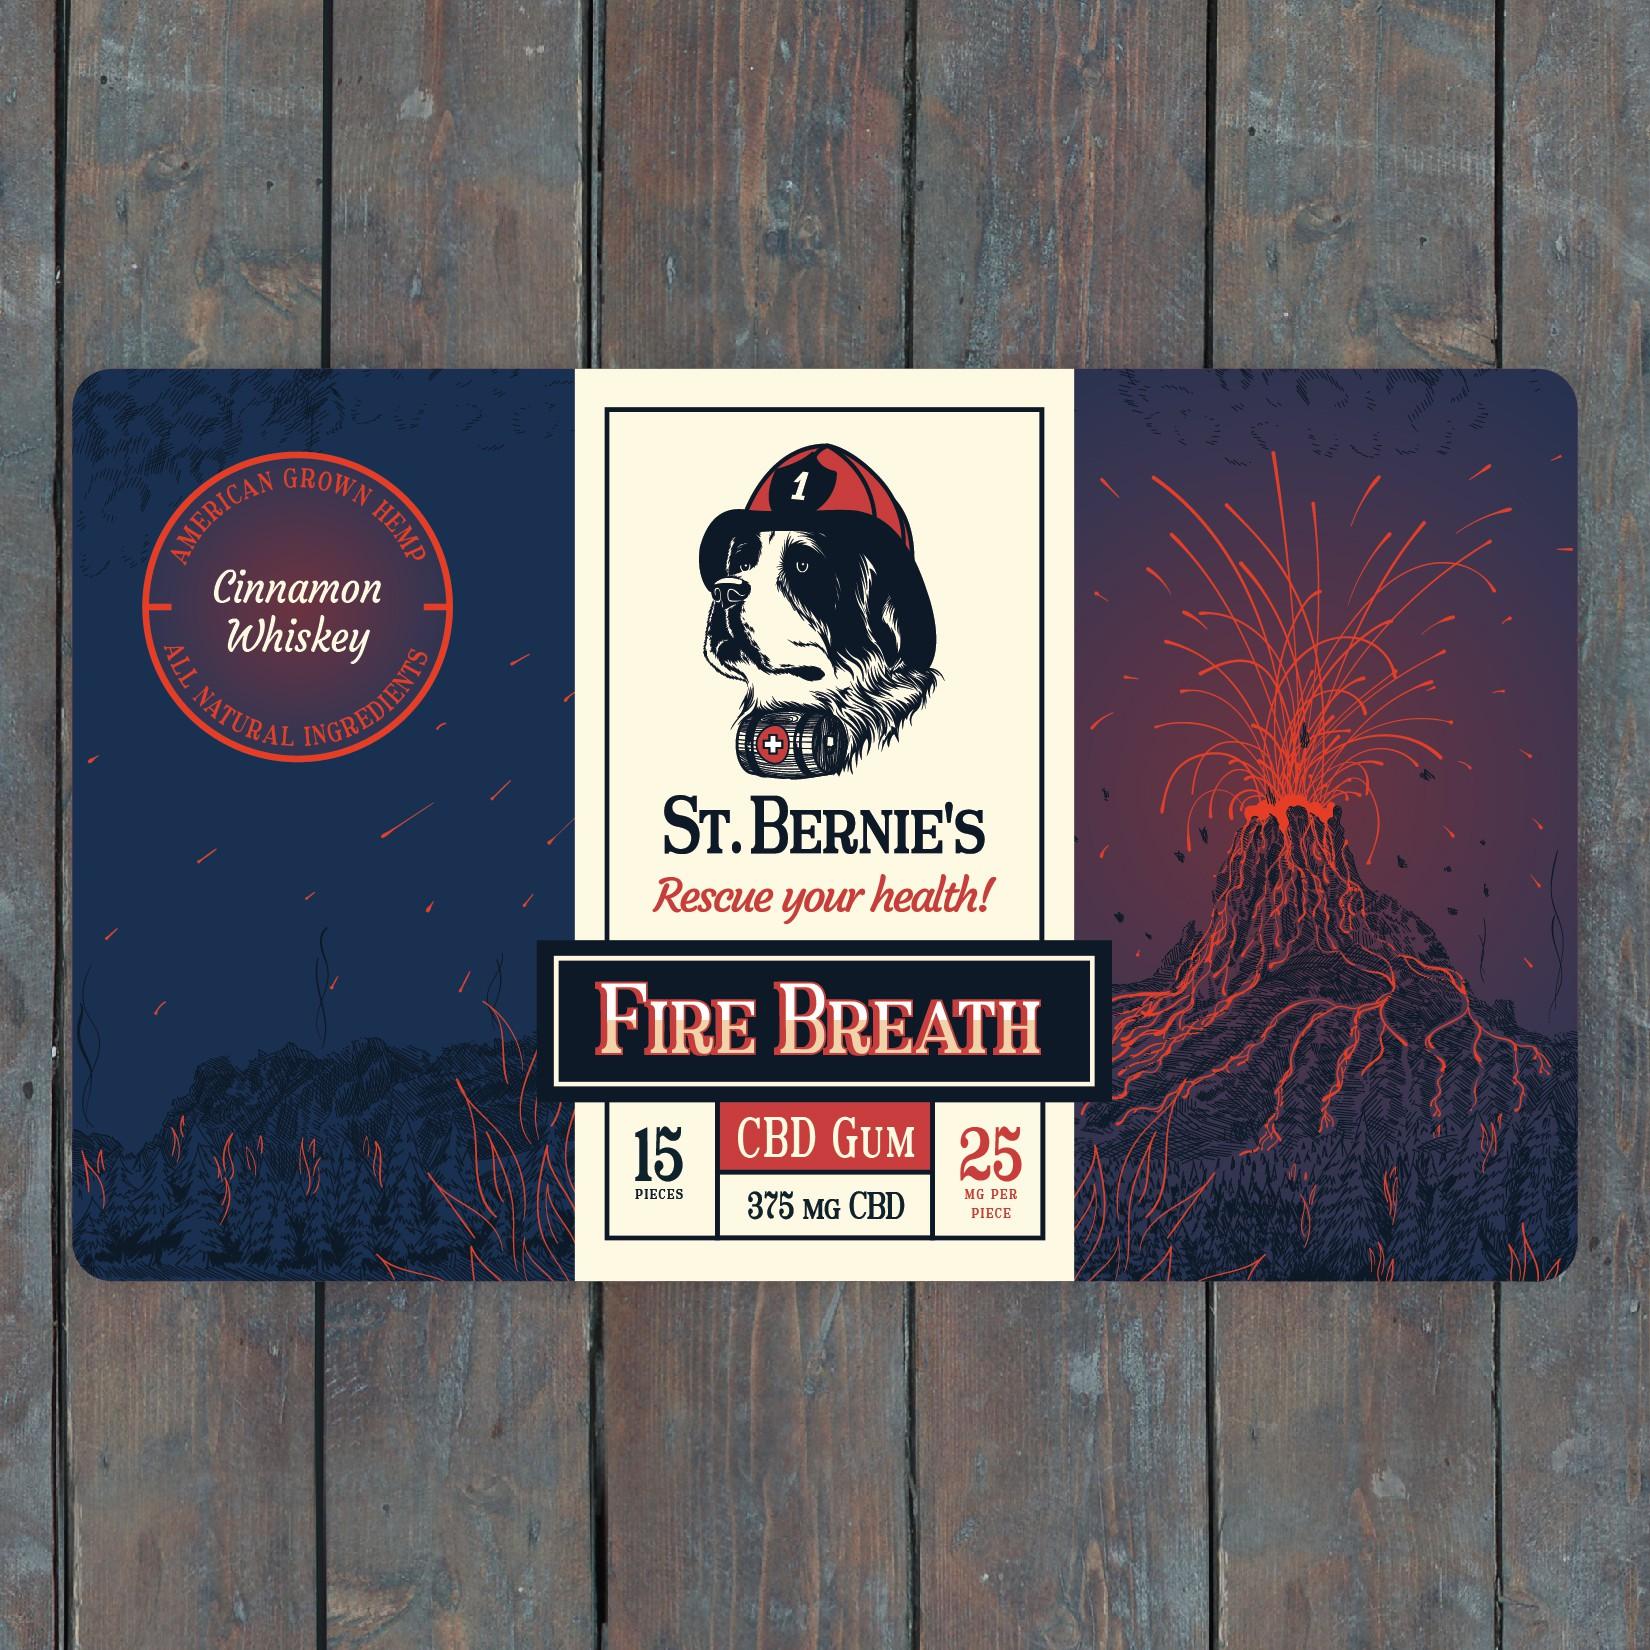 St. Bernie's Fire Breath